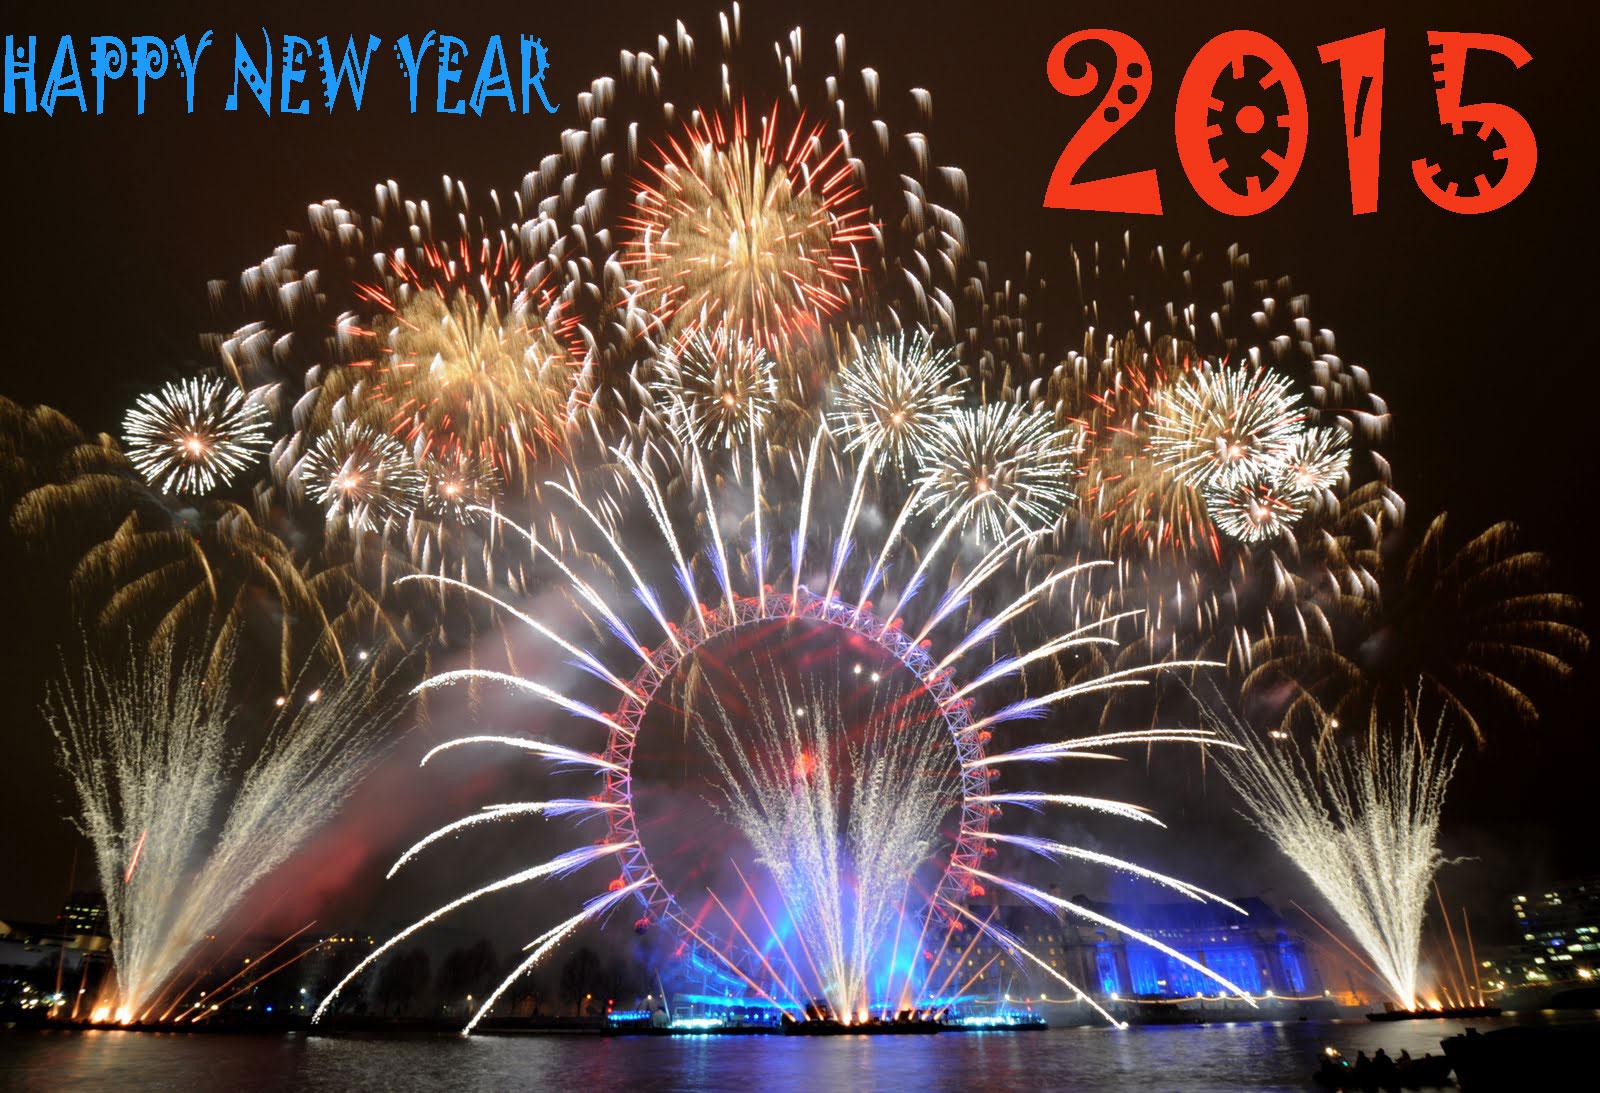 Happy new year 2015 desktop wallpapers hd 1600x1093